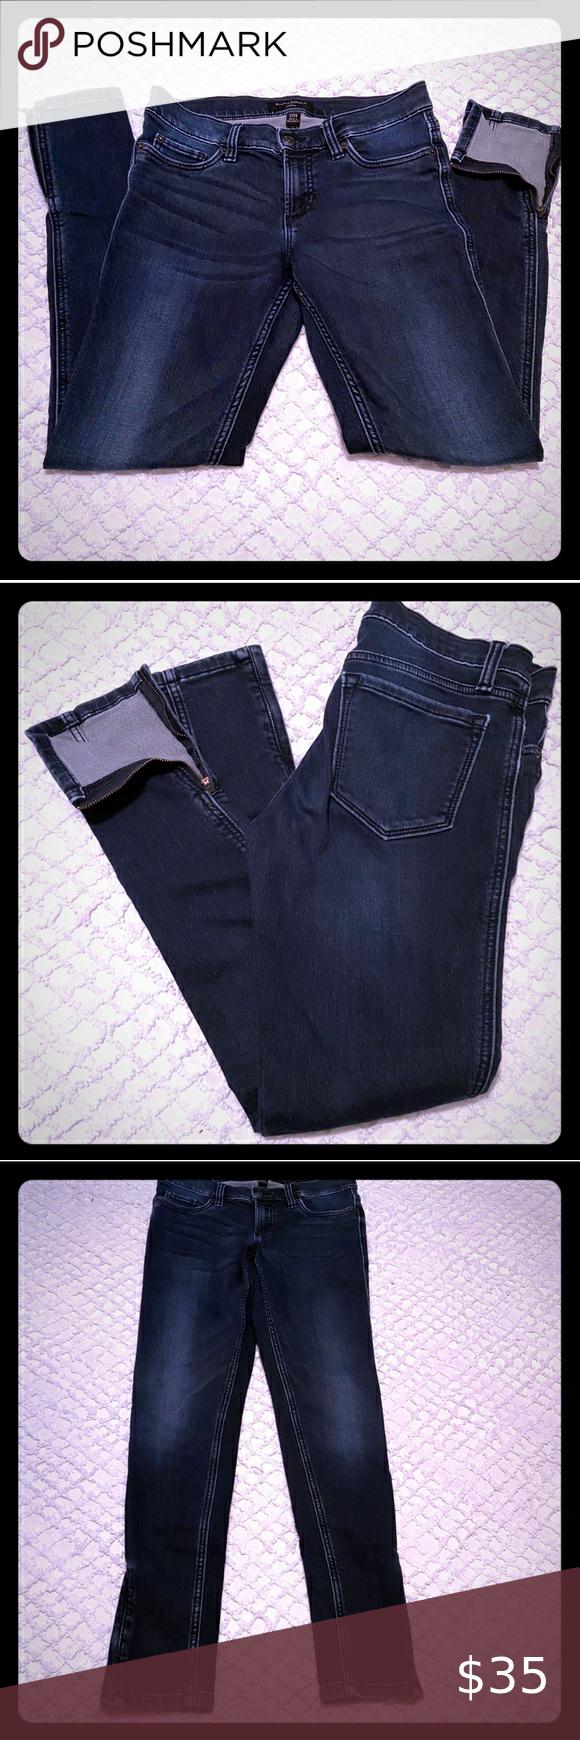 Banana Republic Skinny Jeans Zipper Ankles 27 4 Womens Jeans Skinny Dark Blue Skinny Jeans Blue Skinny Jeans